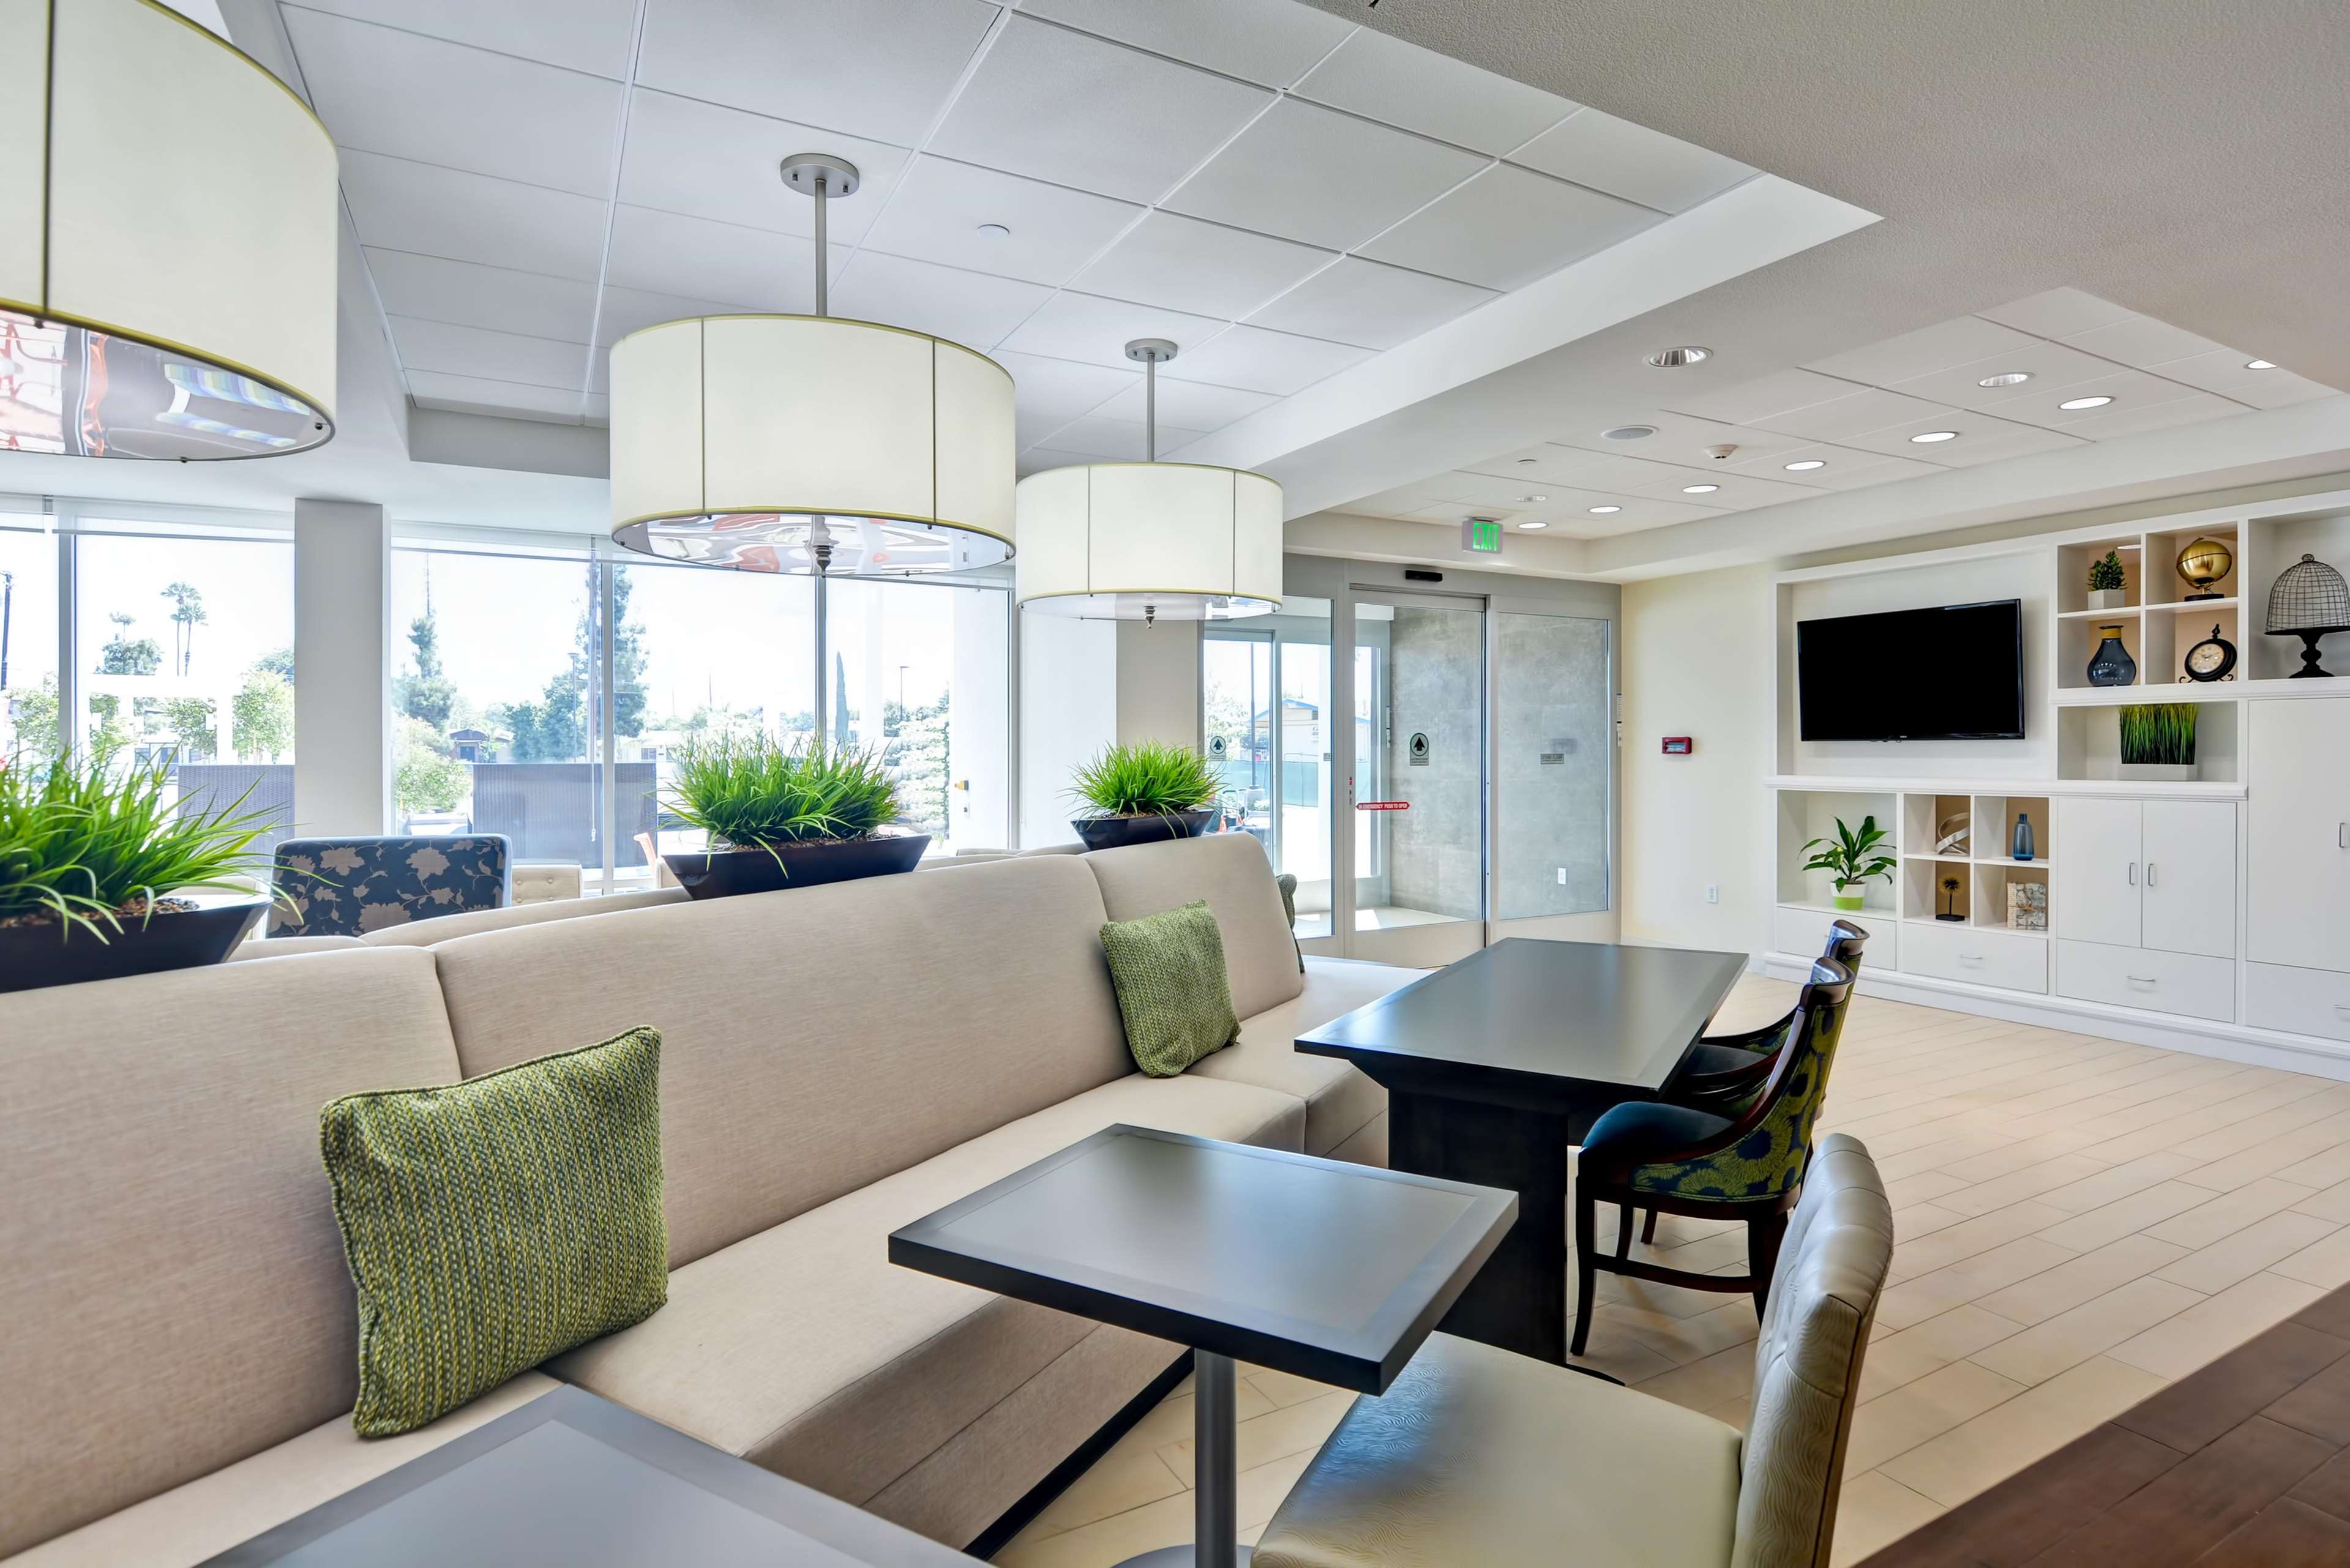 Home2 Suites by Hilton Azusa image 30